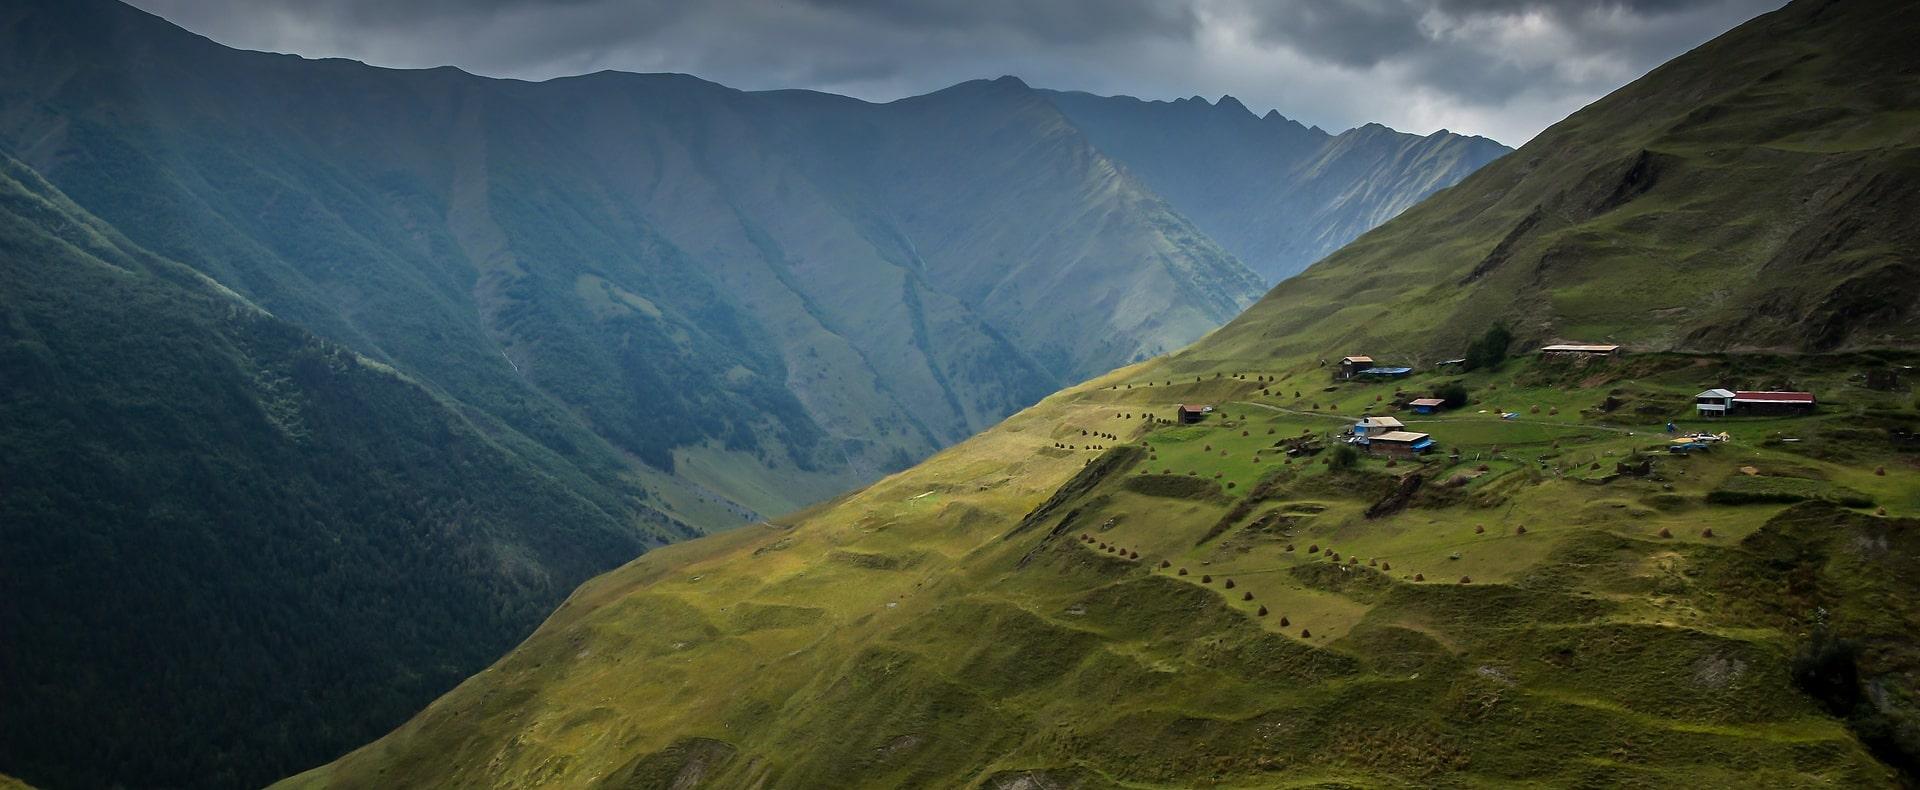 Kakheti Region, Georgia